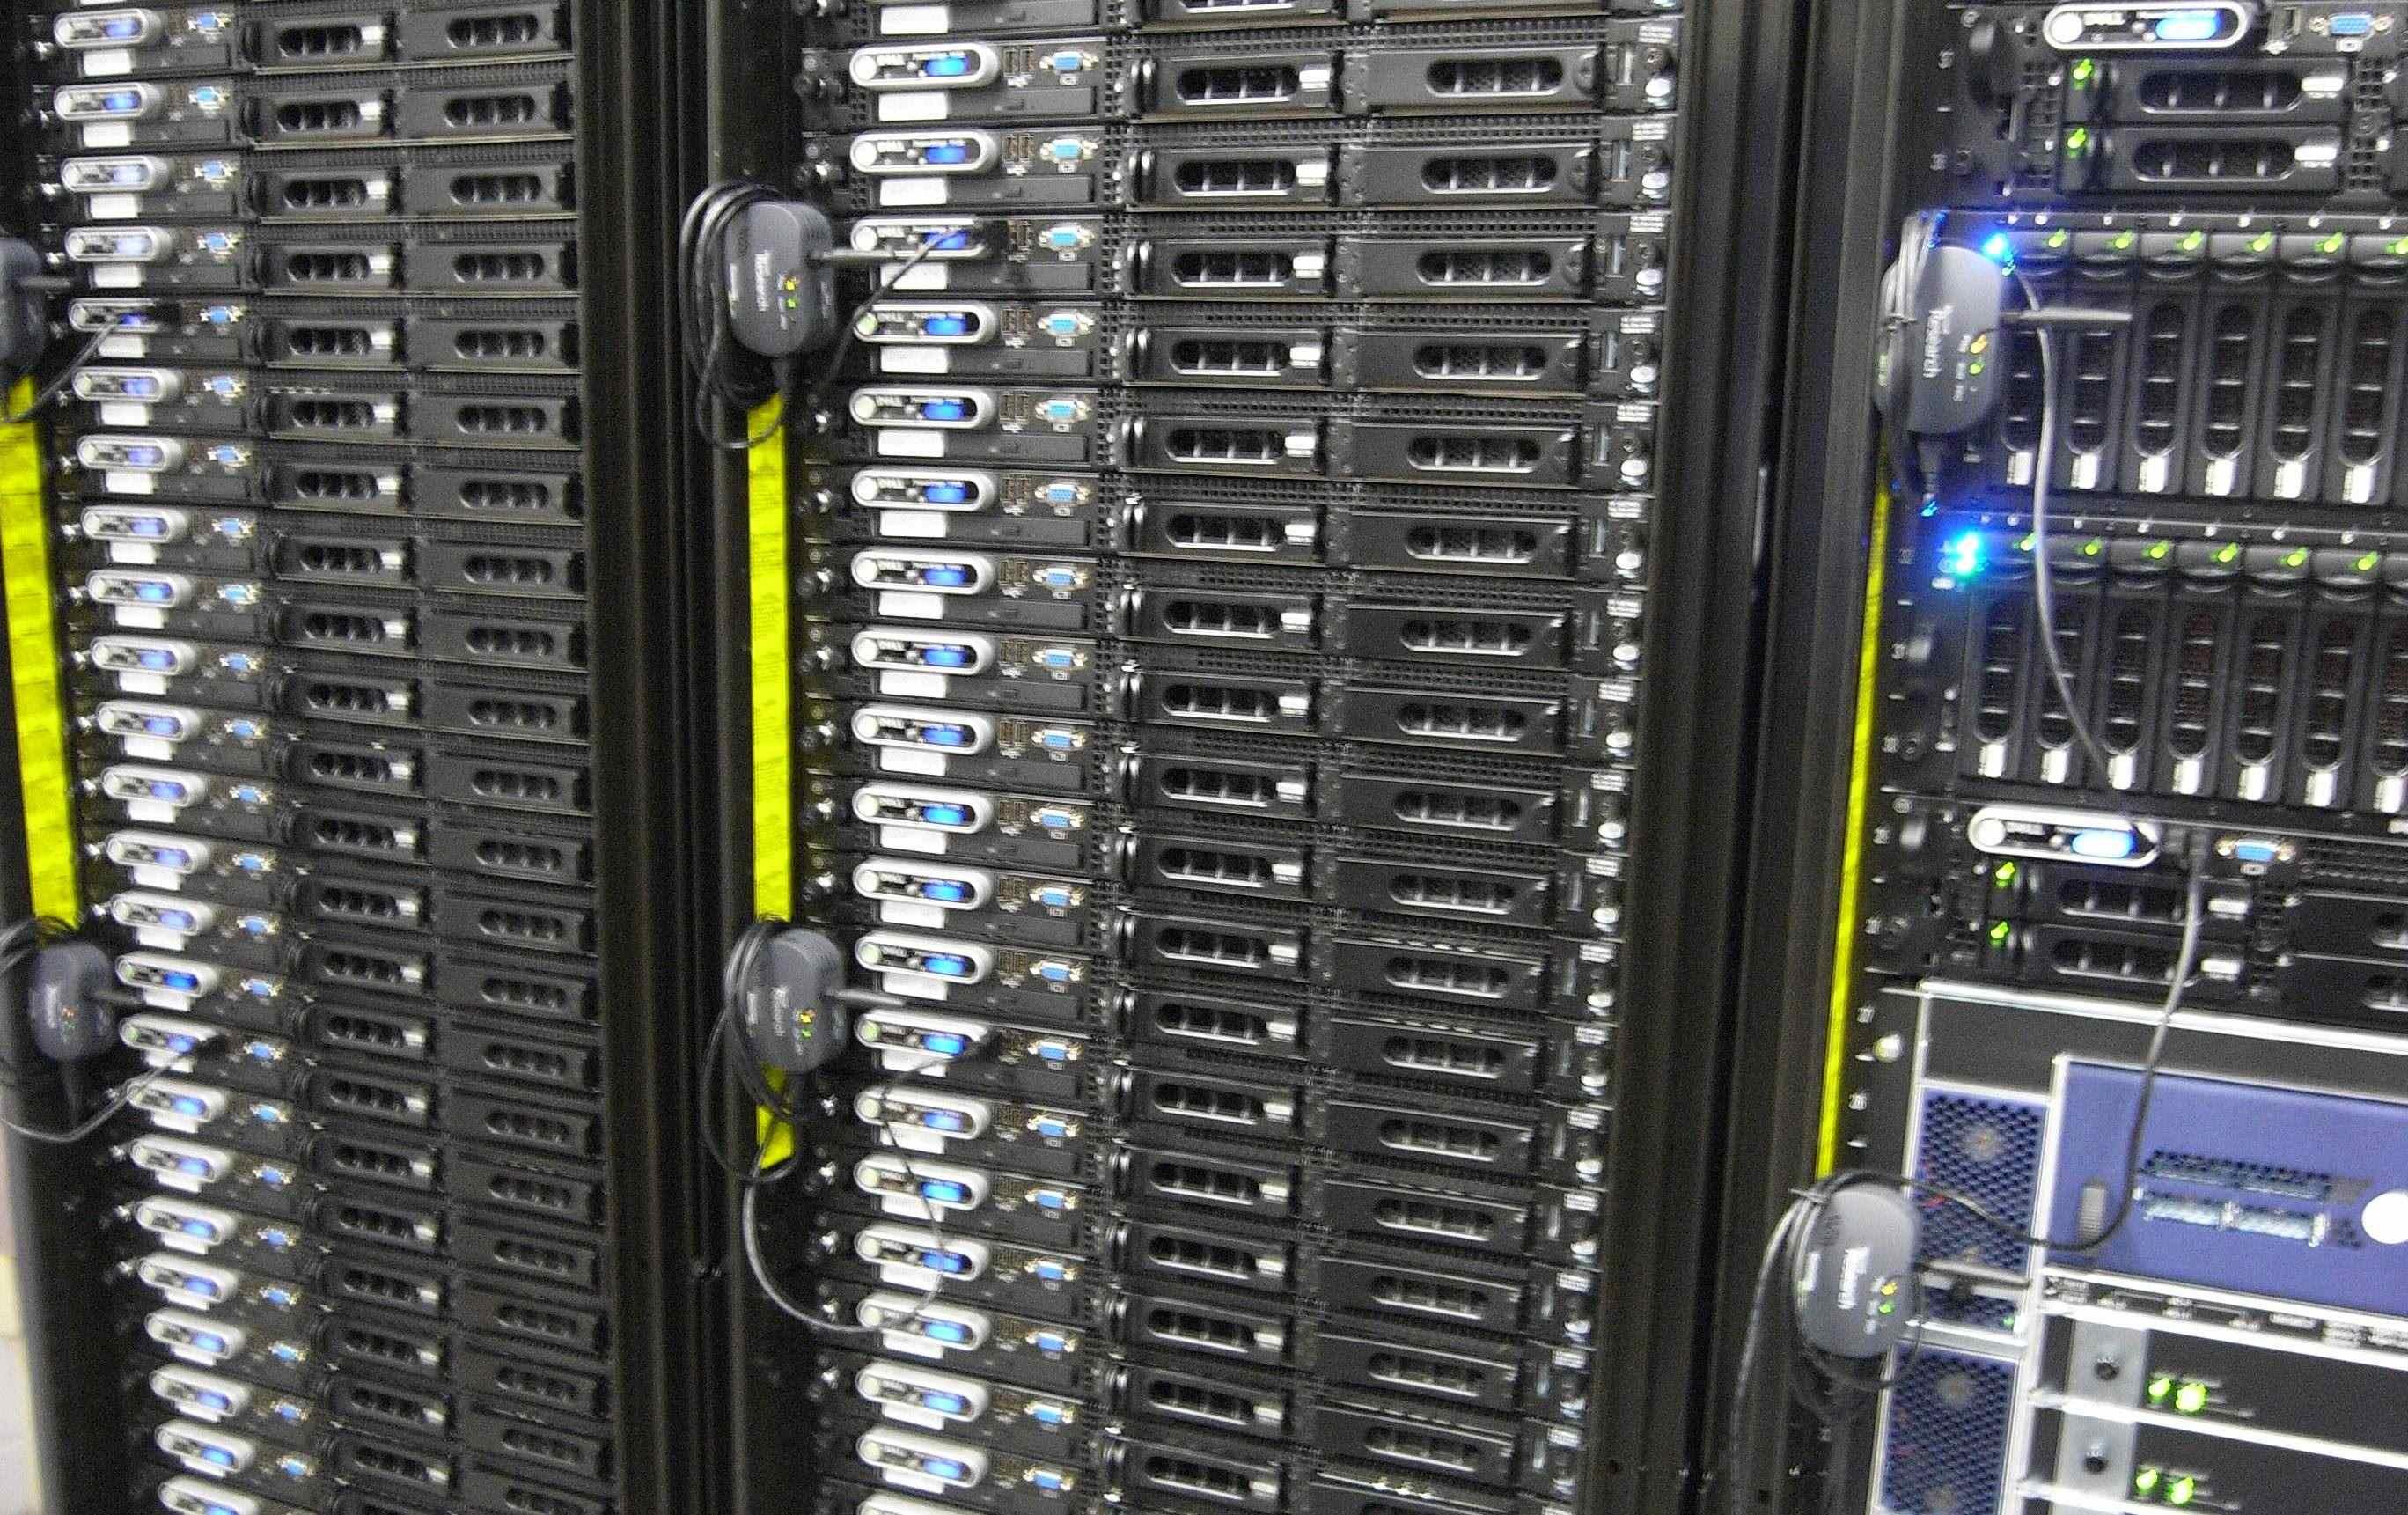 Sub-ISP Solutions